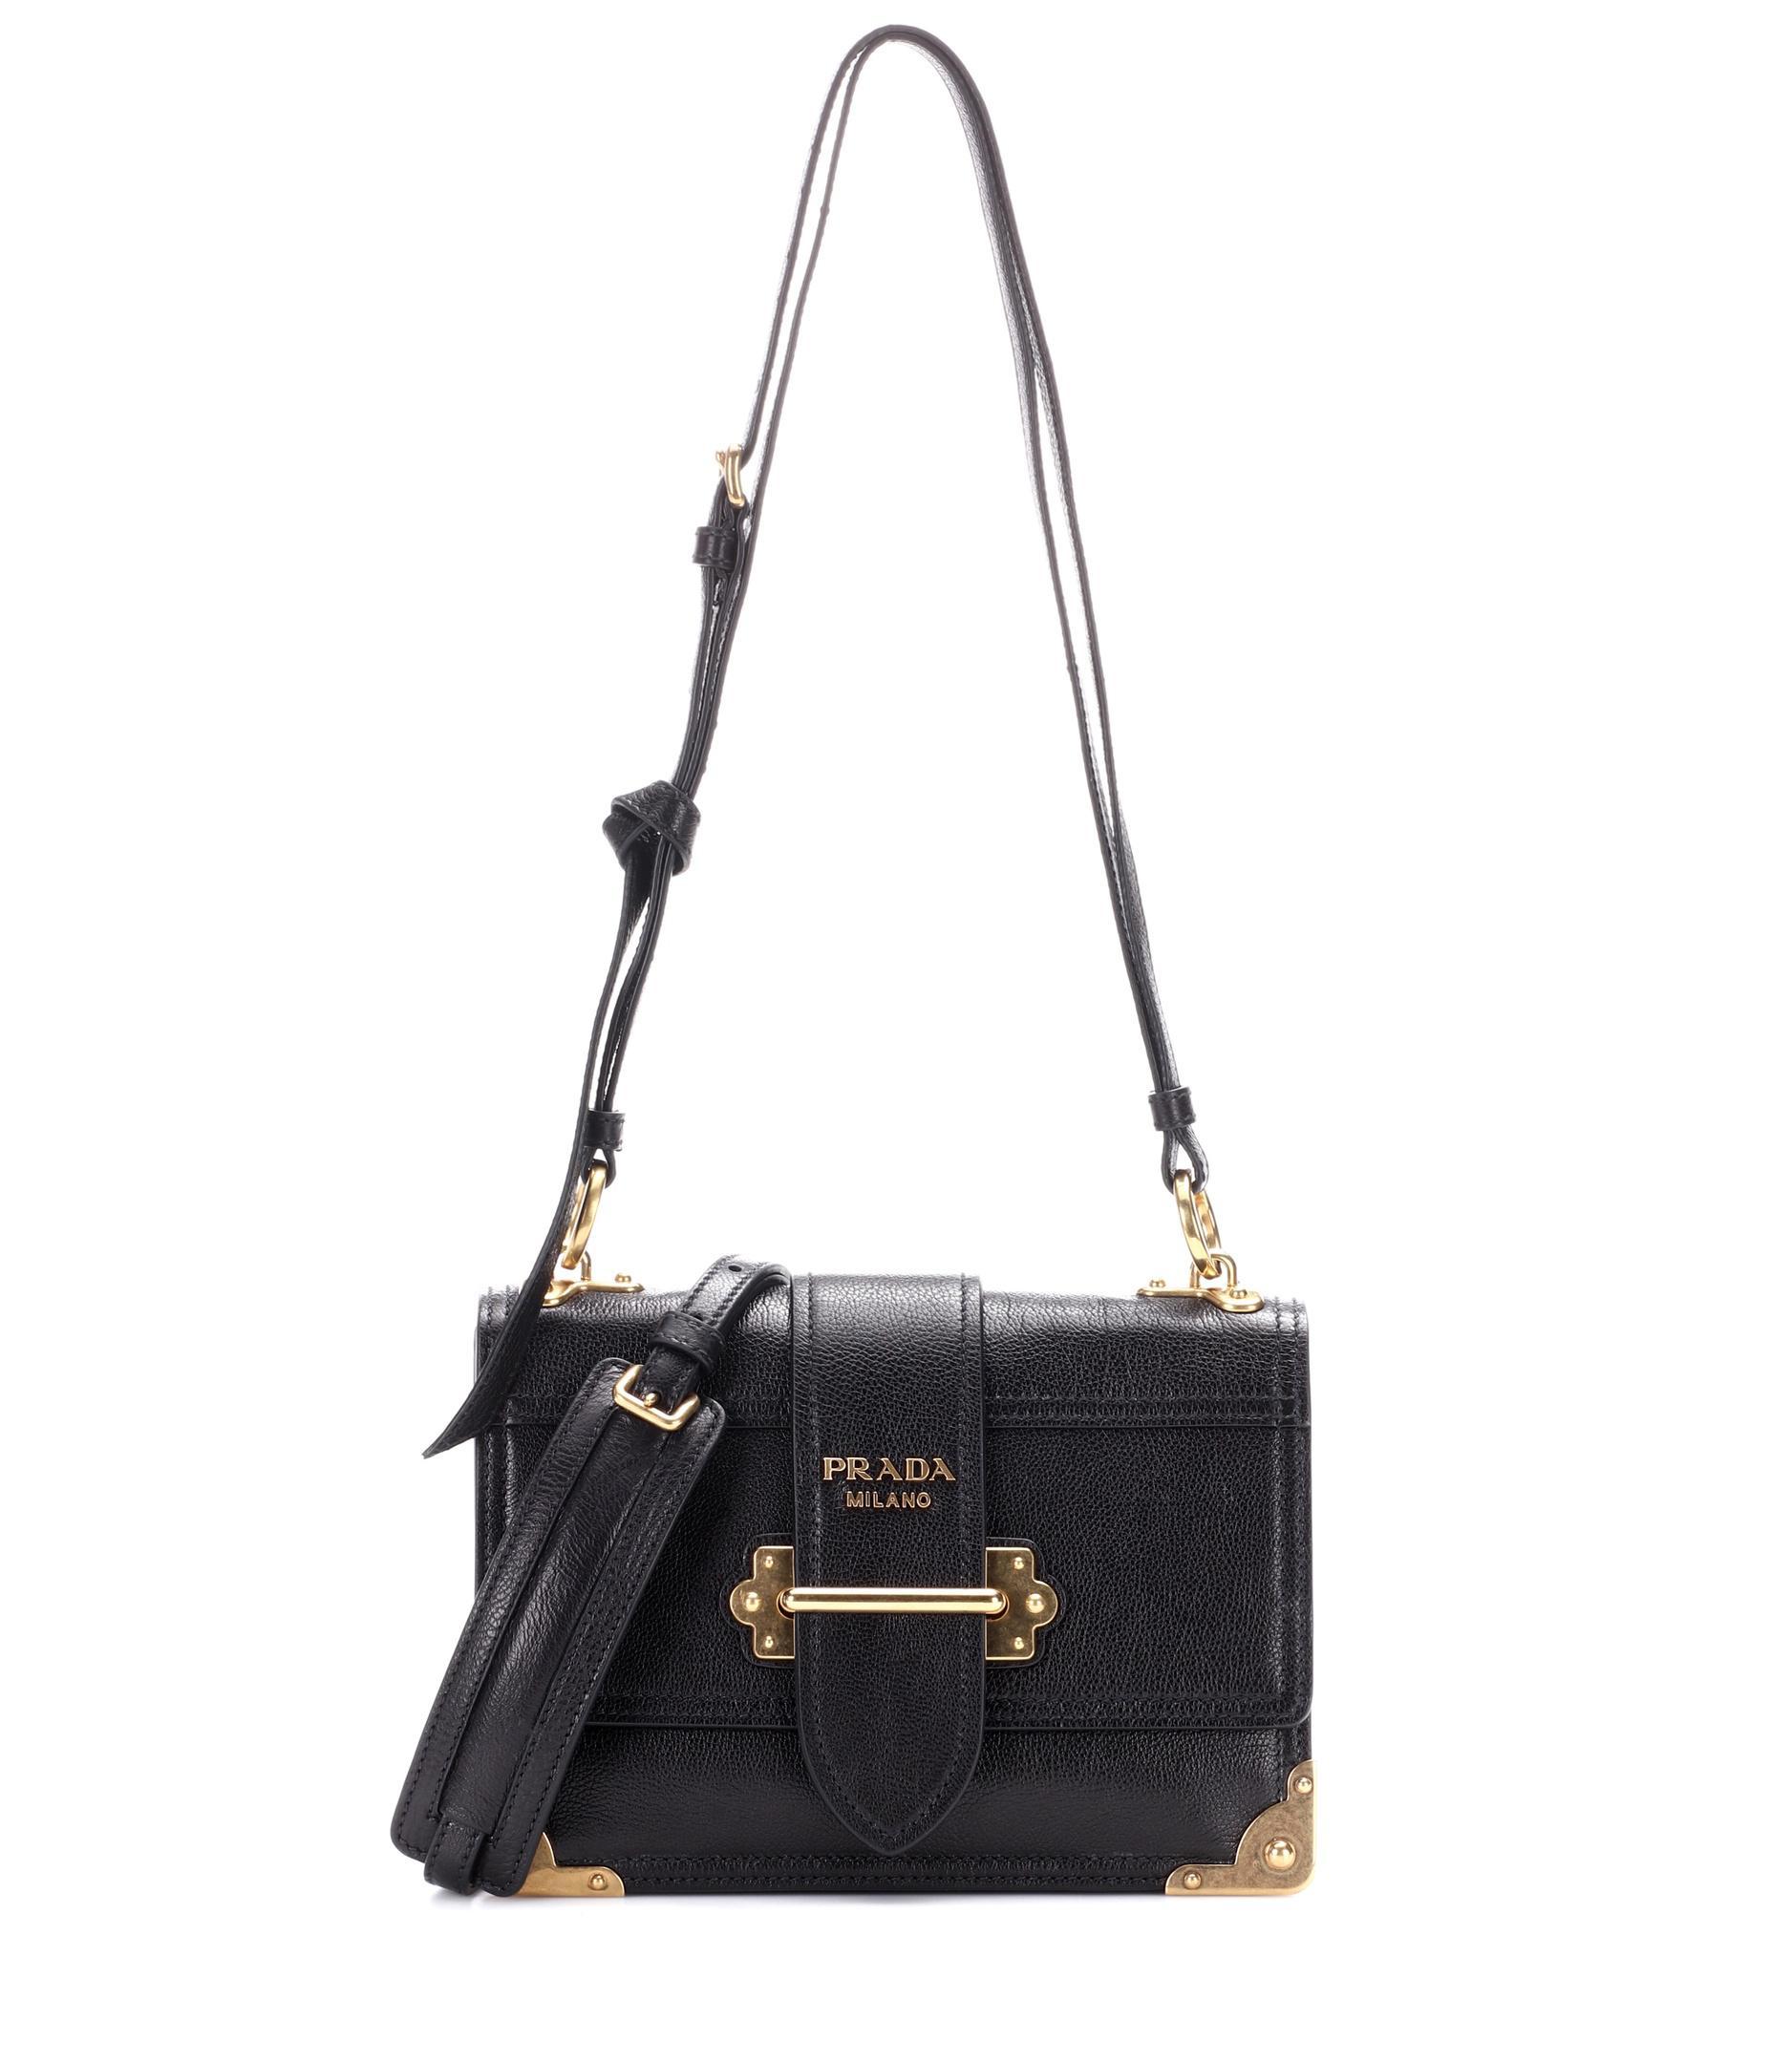 651265e27869 Prada Cahier Leather Shoulder Bag in Black - Lyst